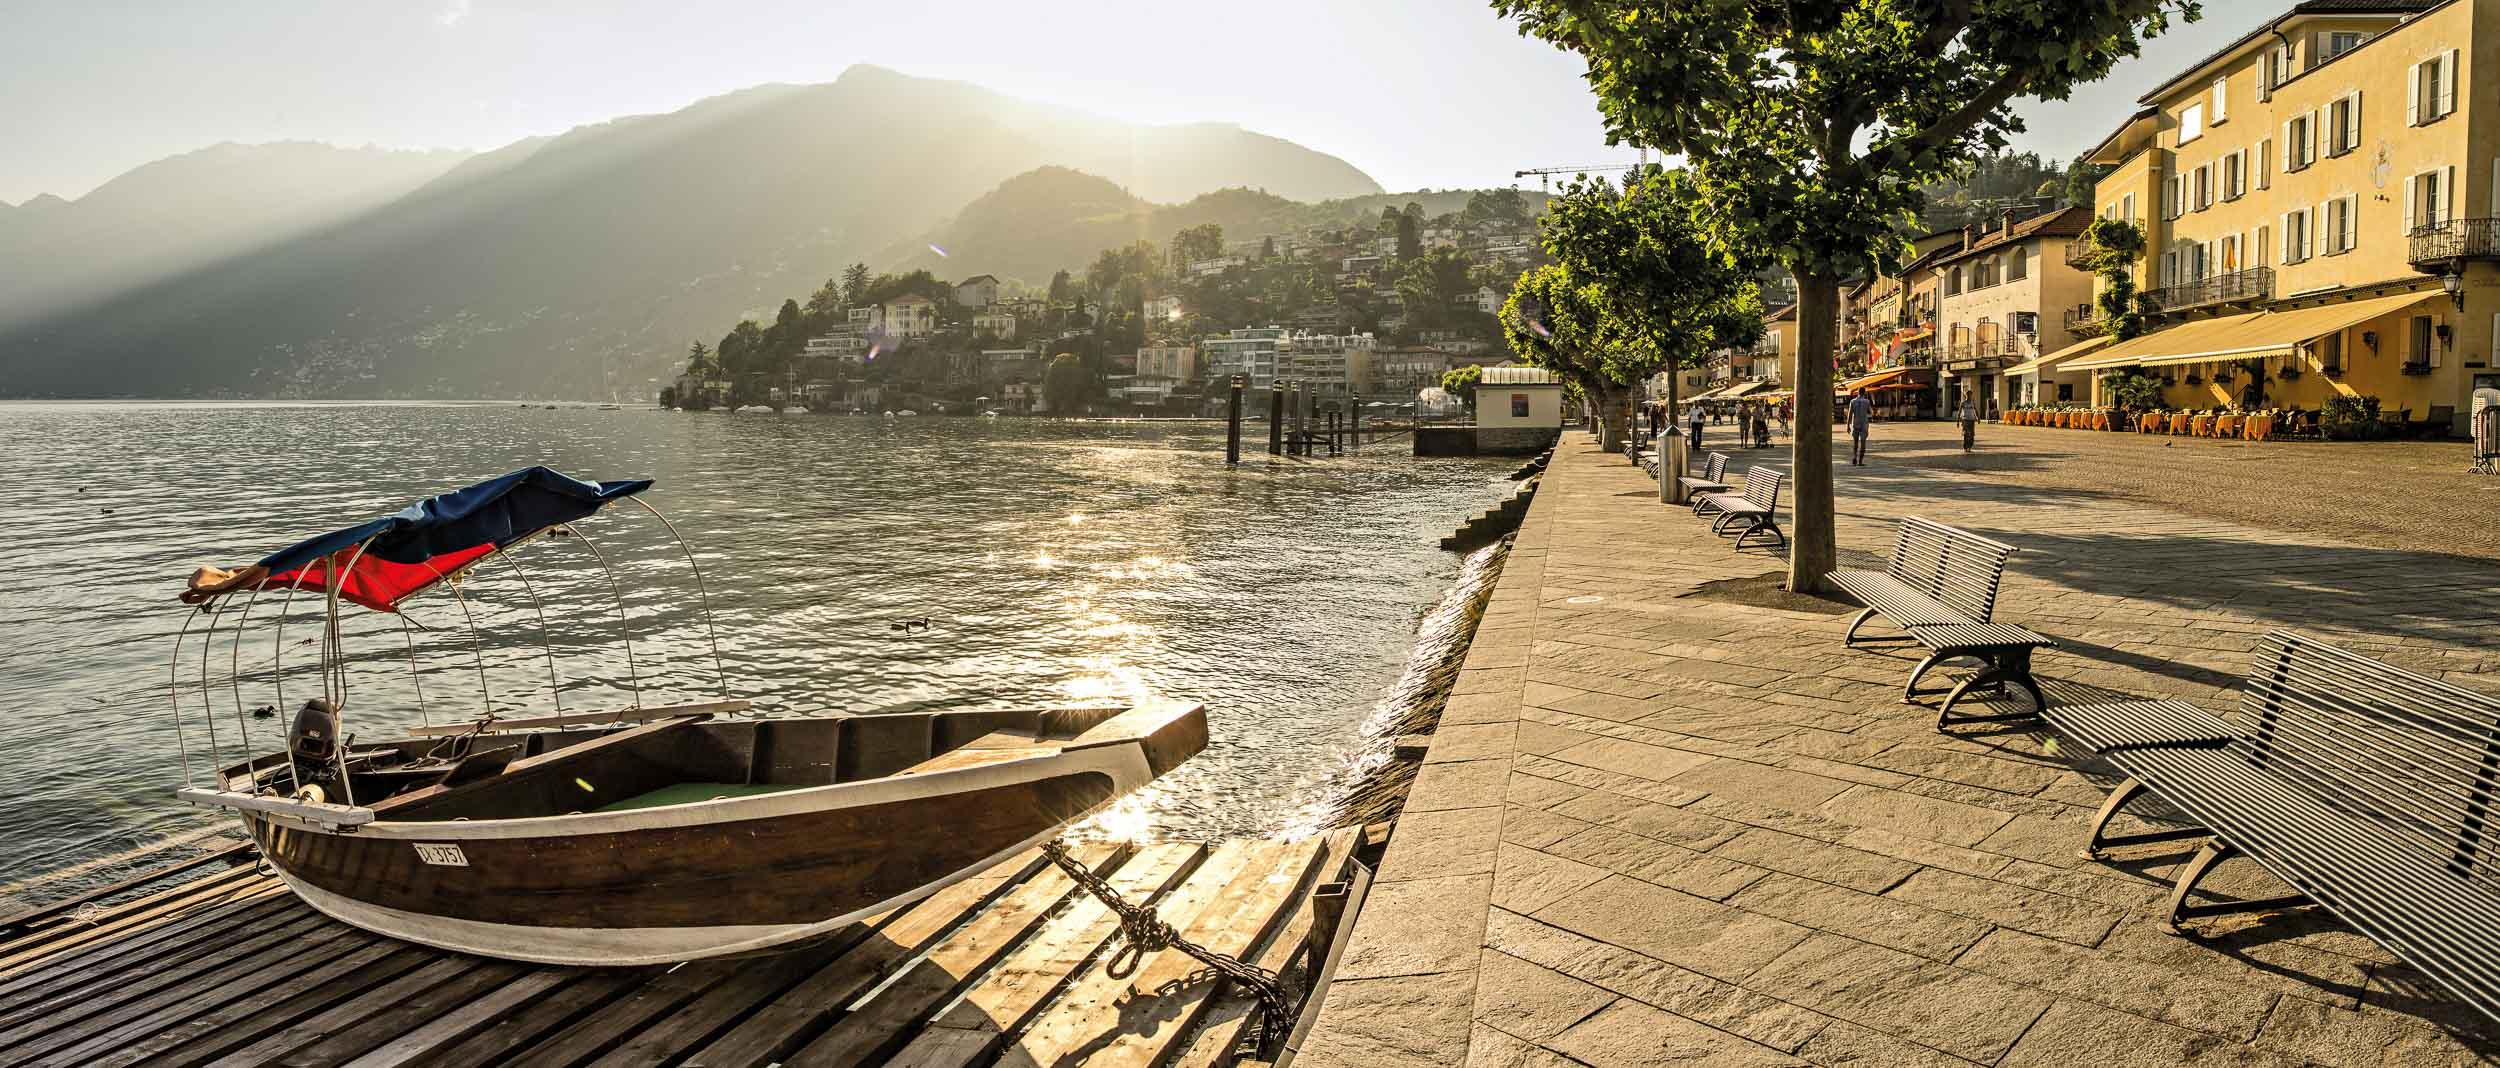 Evening at the lake promenade, Ascona. Copyright by: Switzerland Tourism